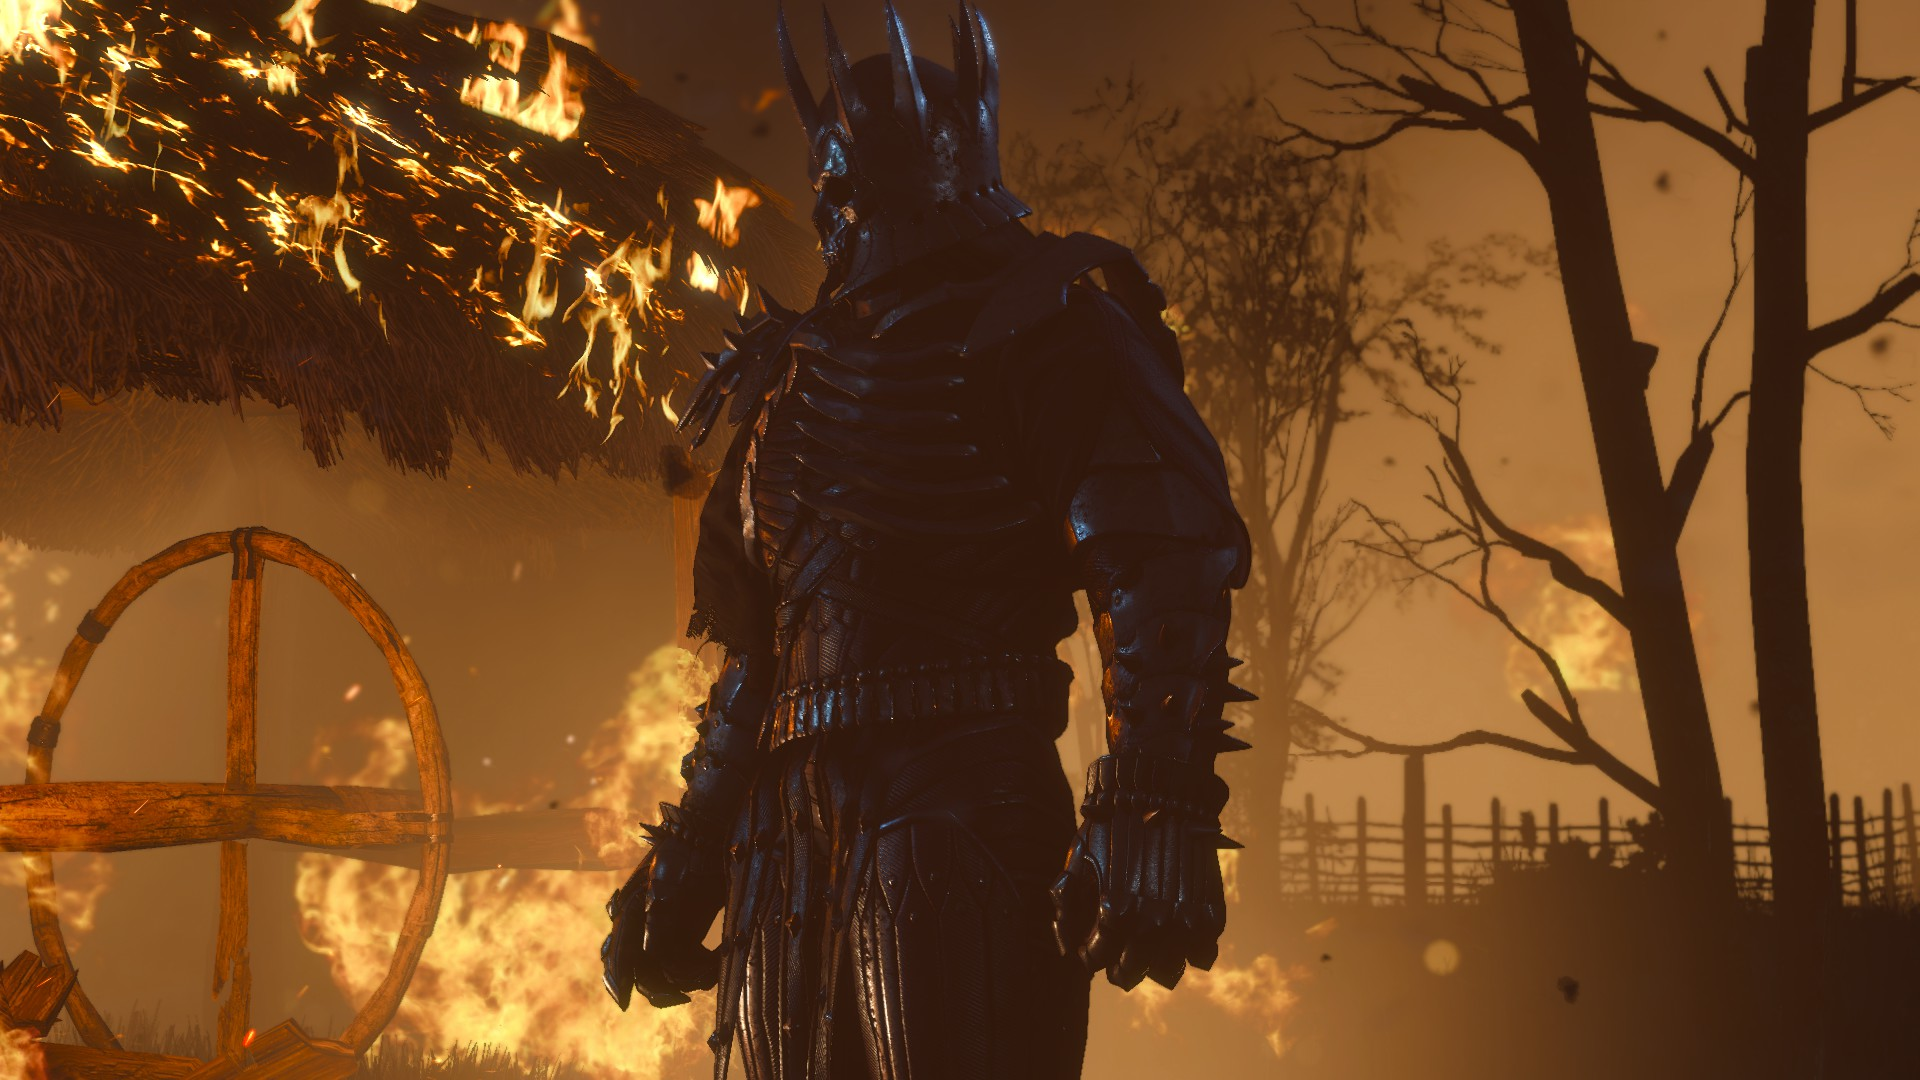 292030_screenshots_20170715021201_1.jpg - Witcher 3: Wild Hunt, the